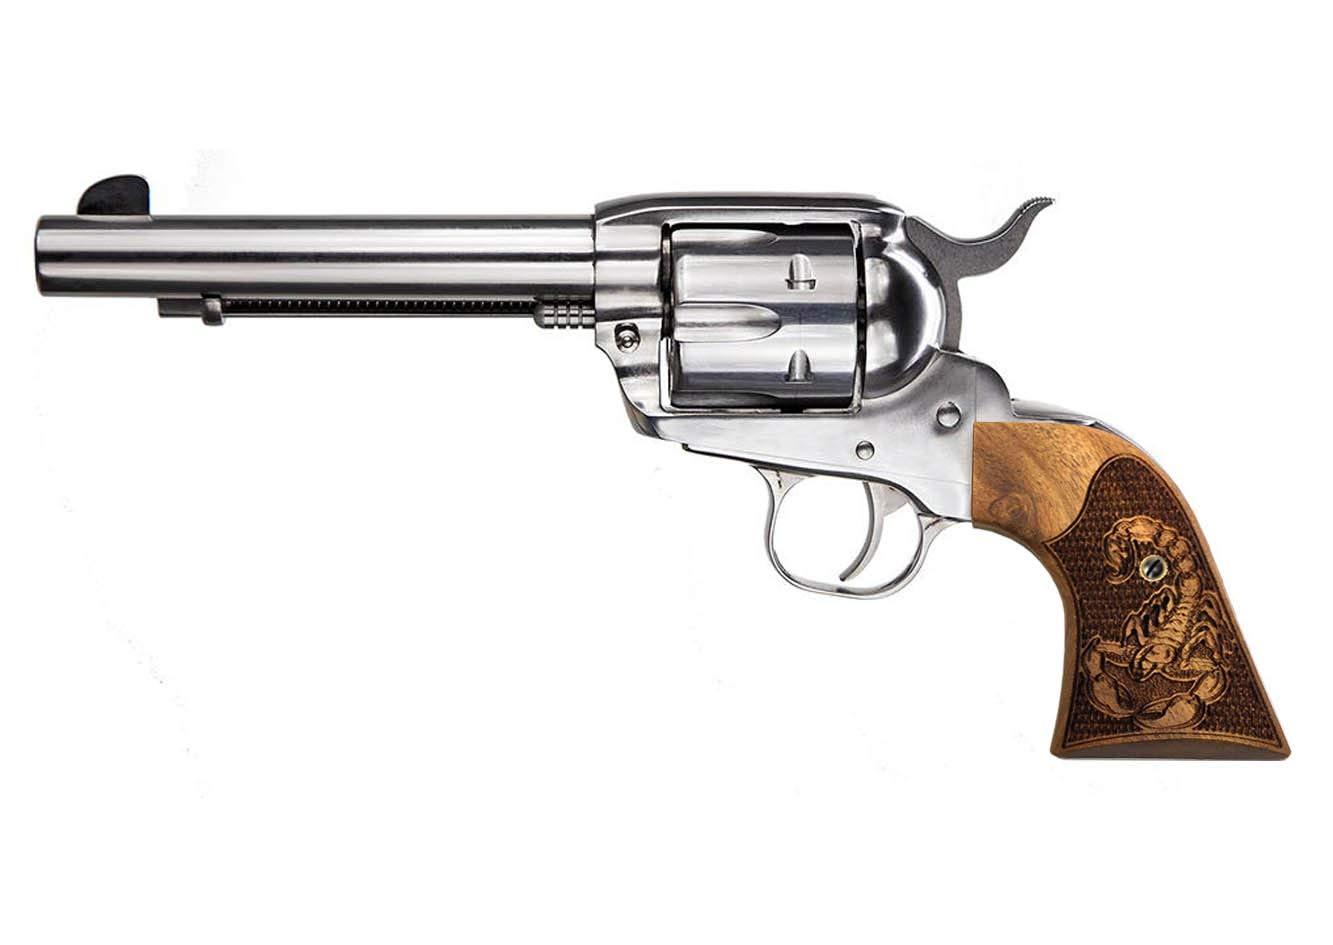 Ruger Grips New Vaquero /& 50th Anniversary Blackhawk Exotic Hardwood Scorpion